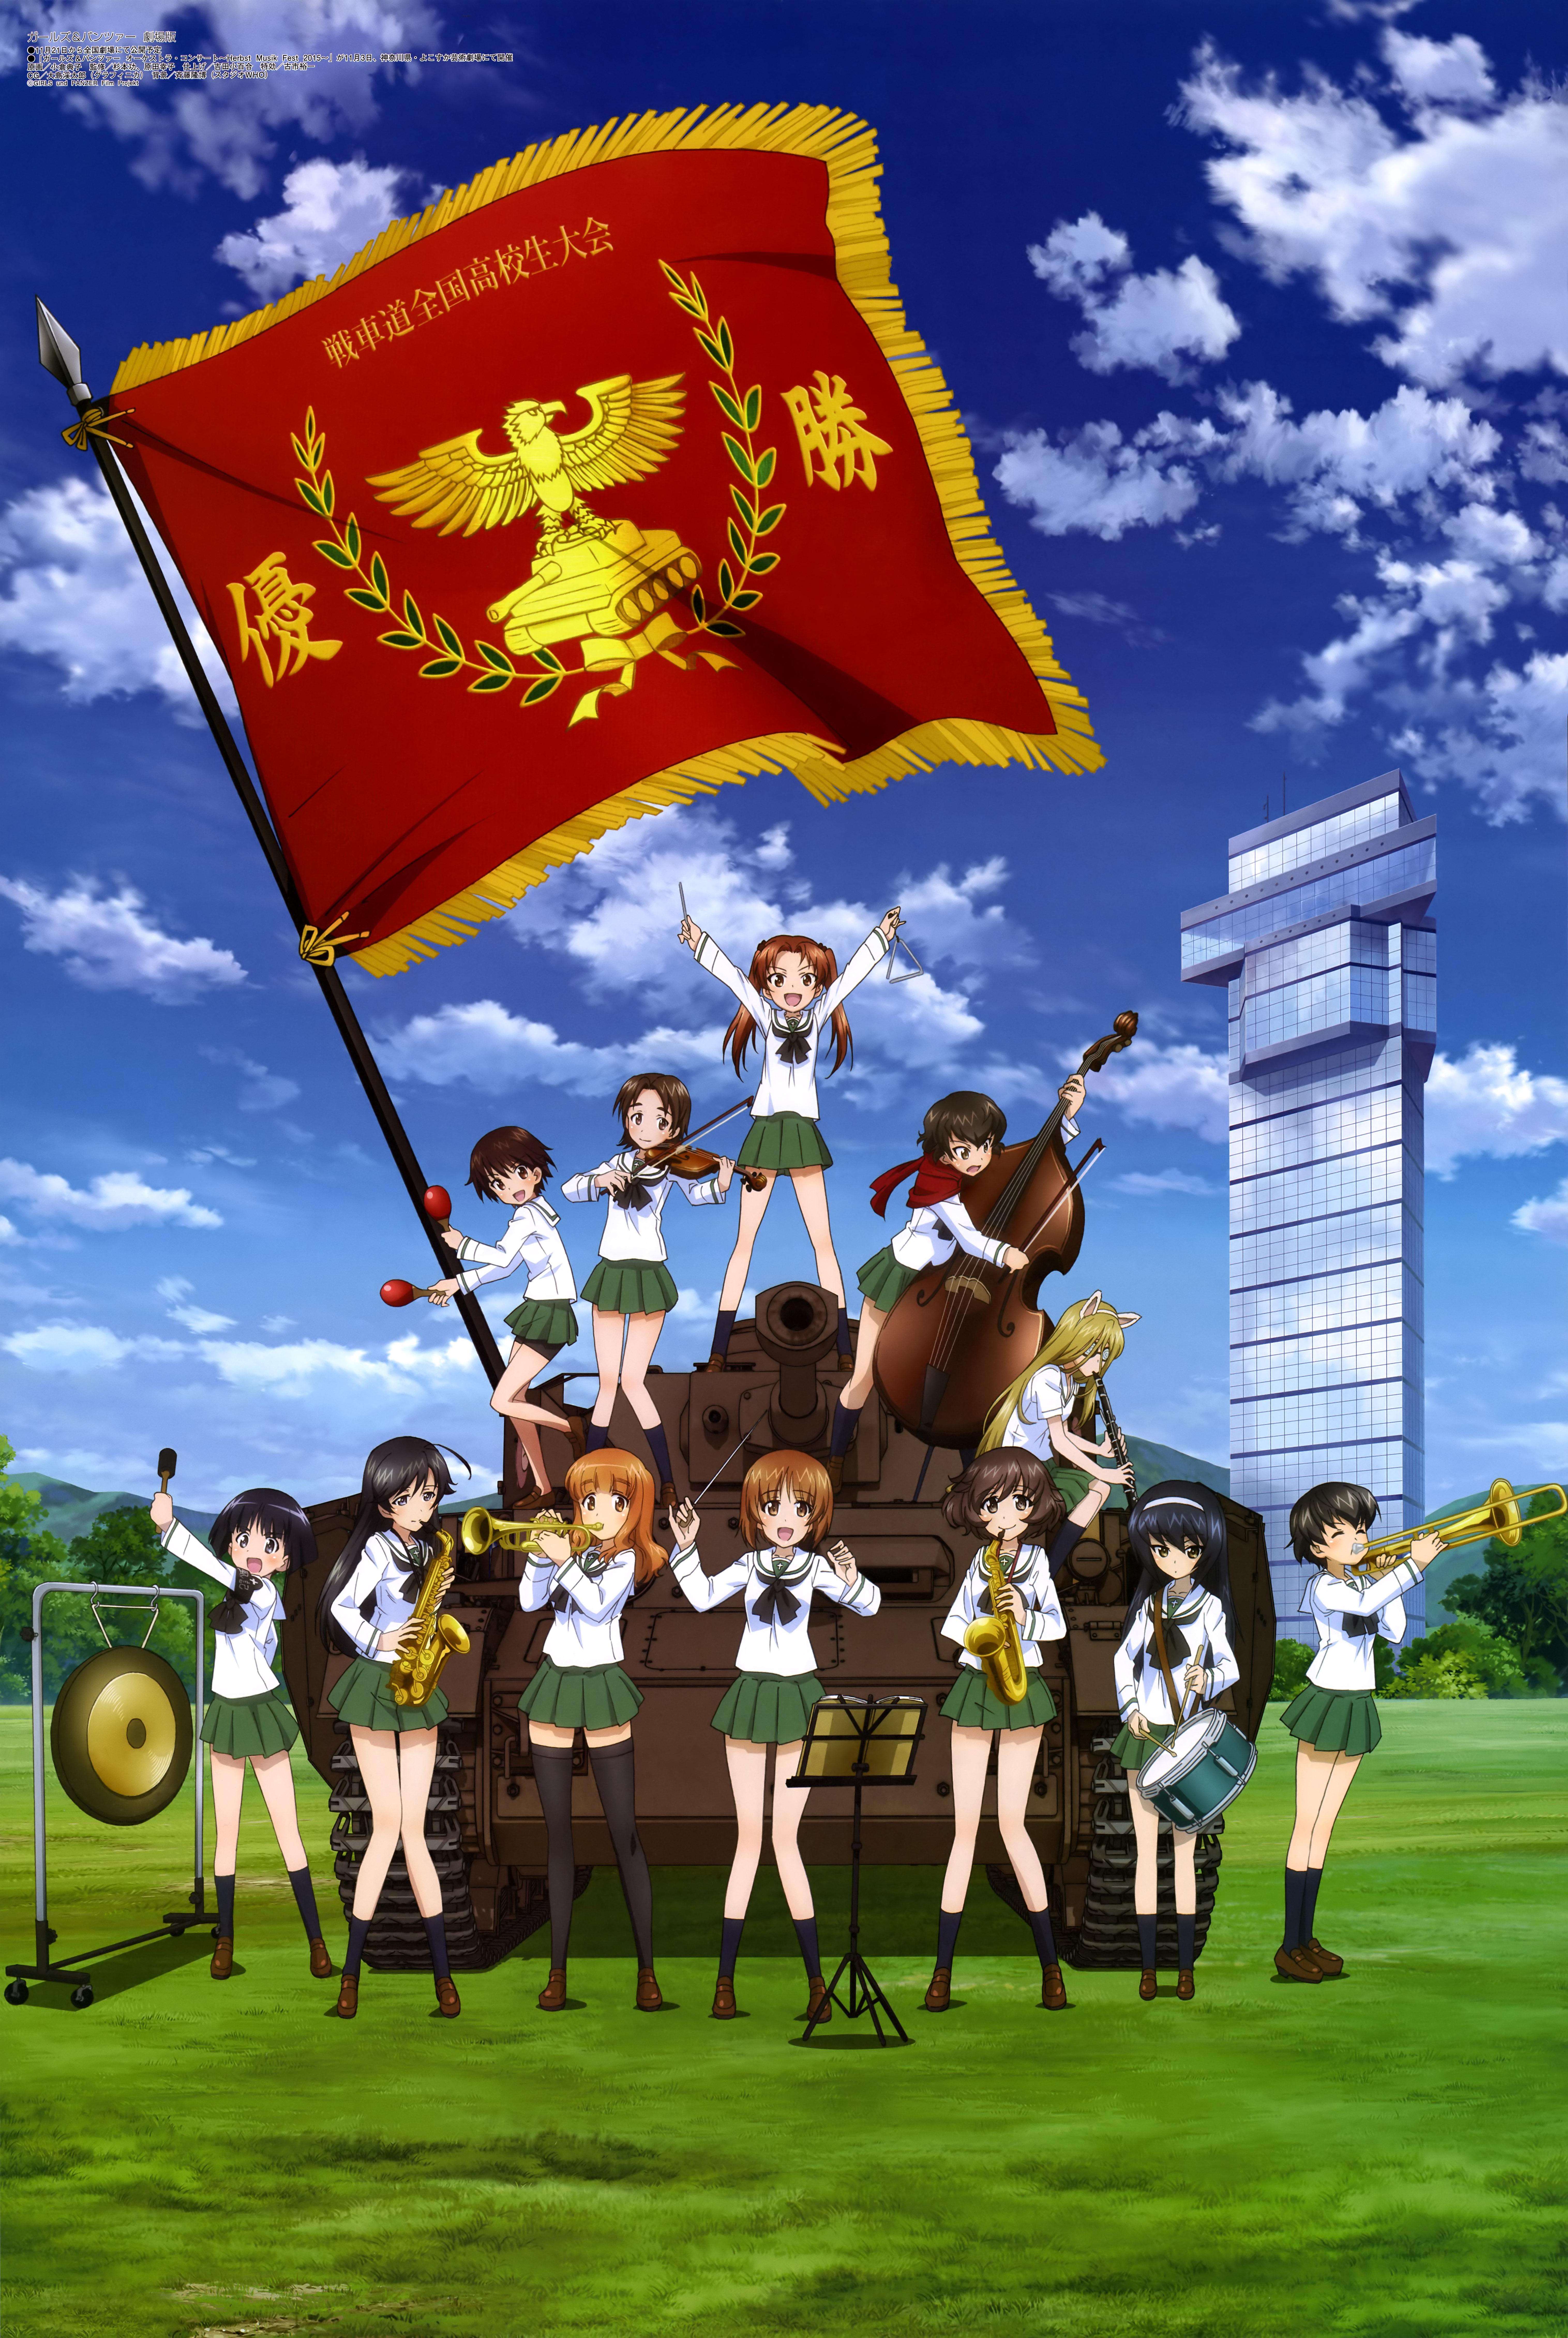 Sawa Azusa Girls Und Panzer Zerochan Anime Image Board